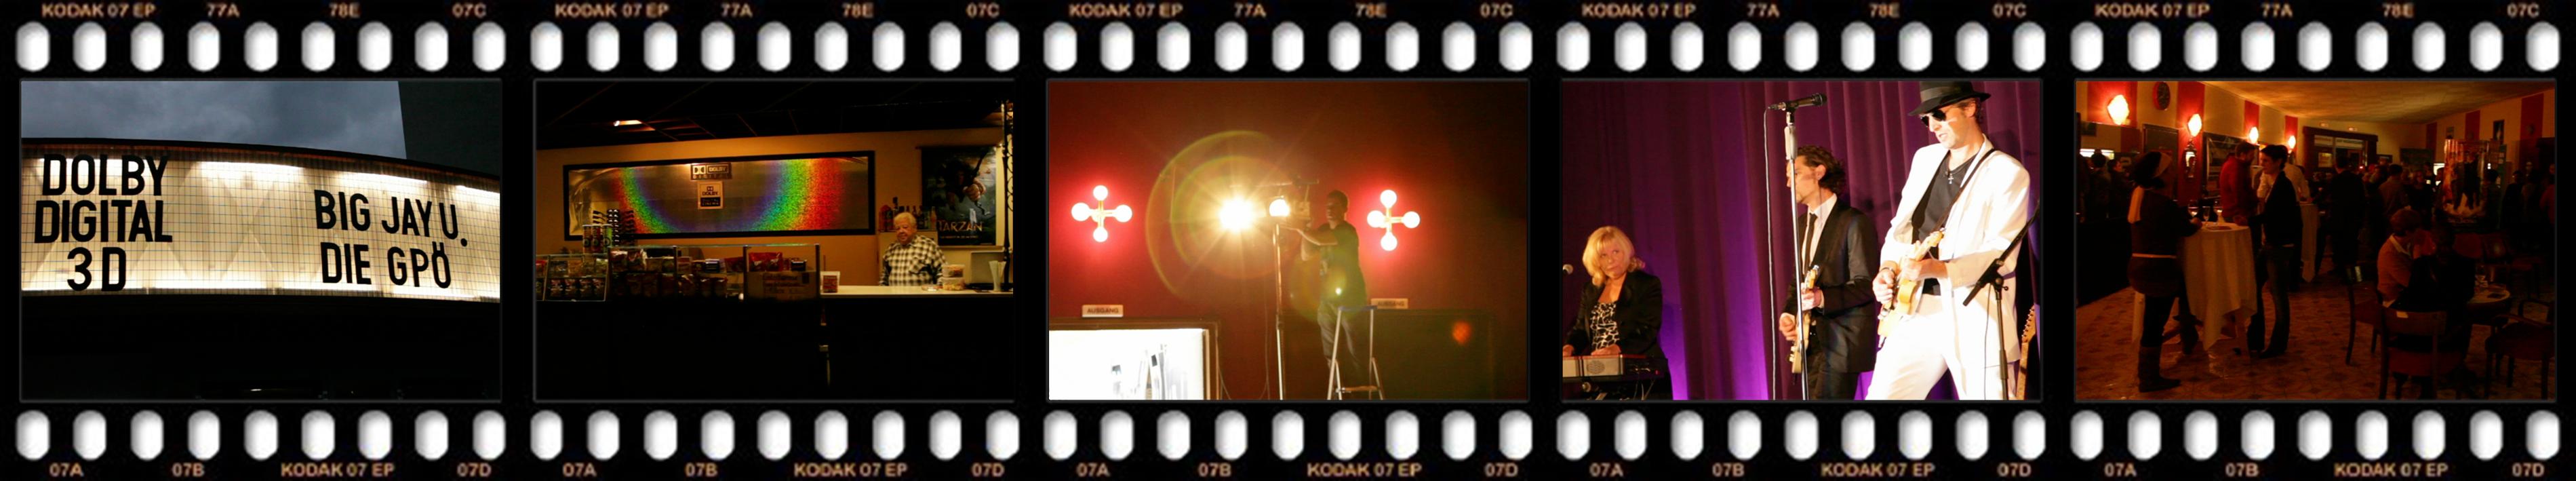 Filmstreifen_GPÖ_RGB